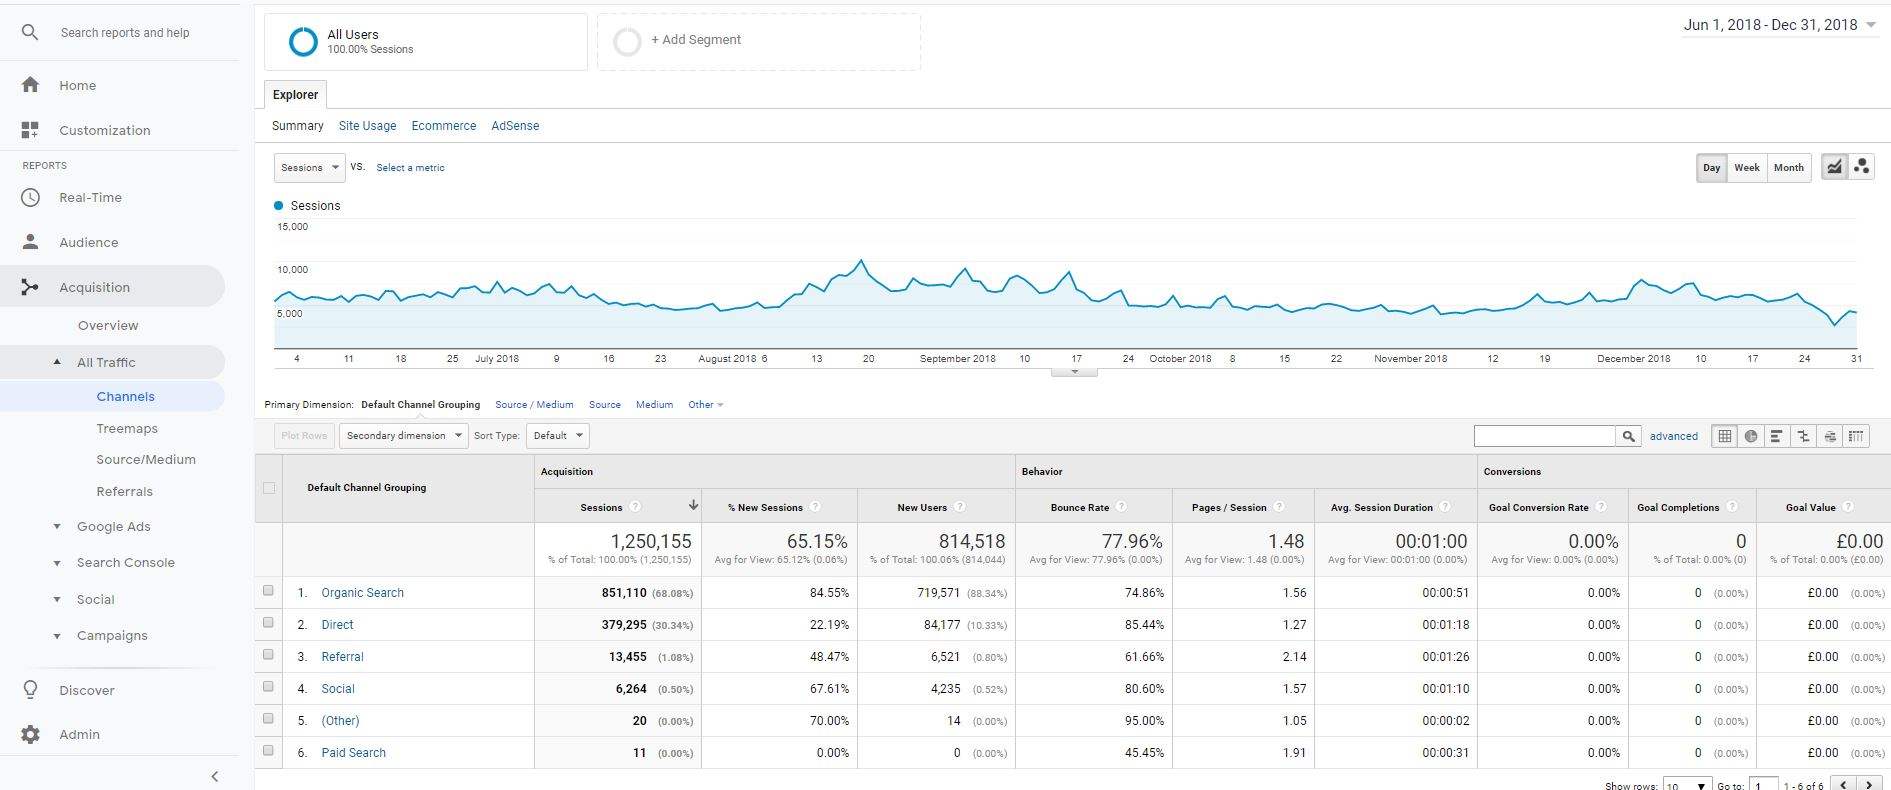 seo asset generating 1250155 visits